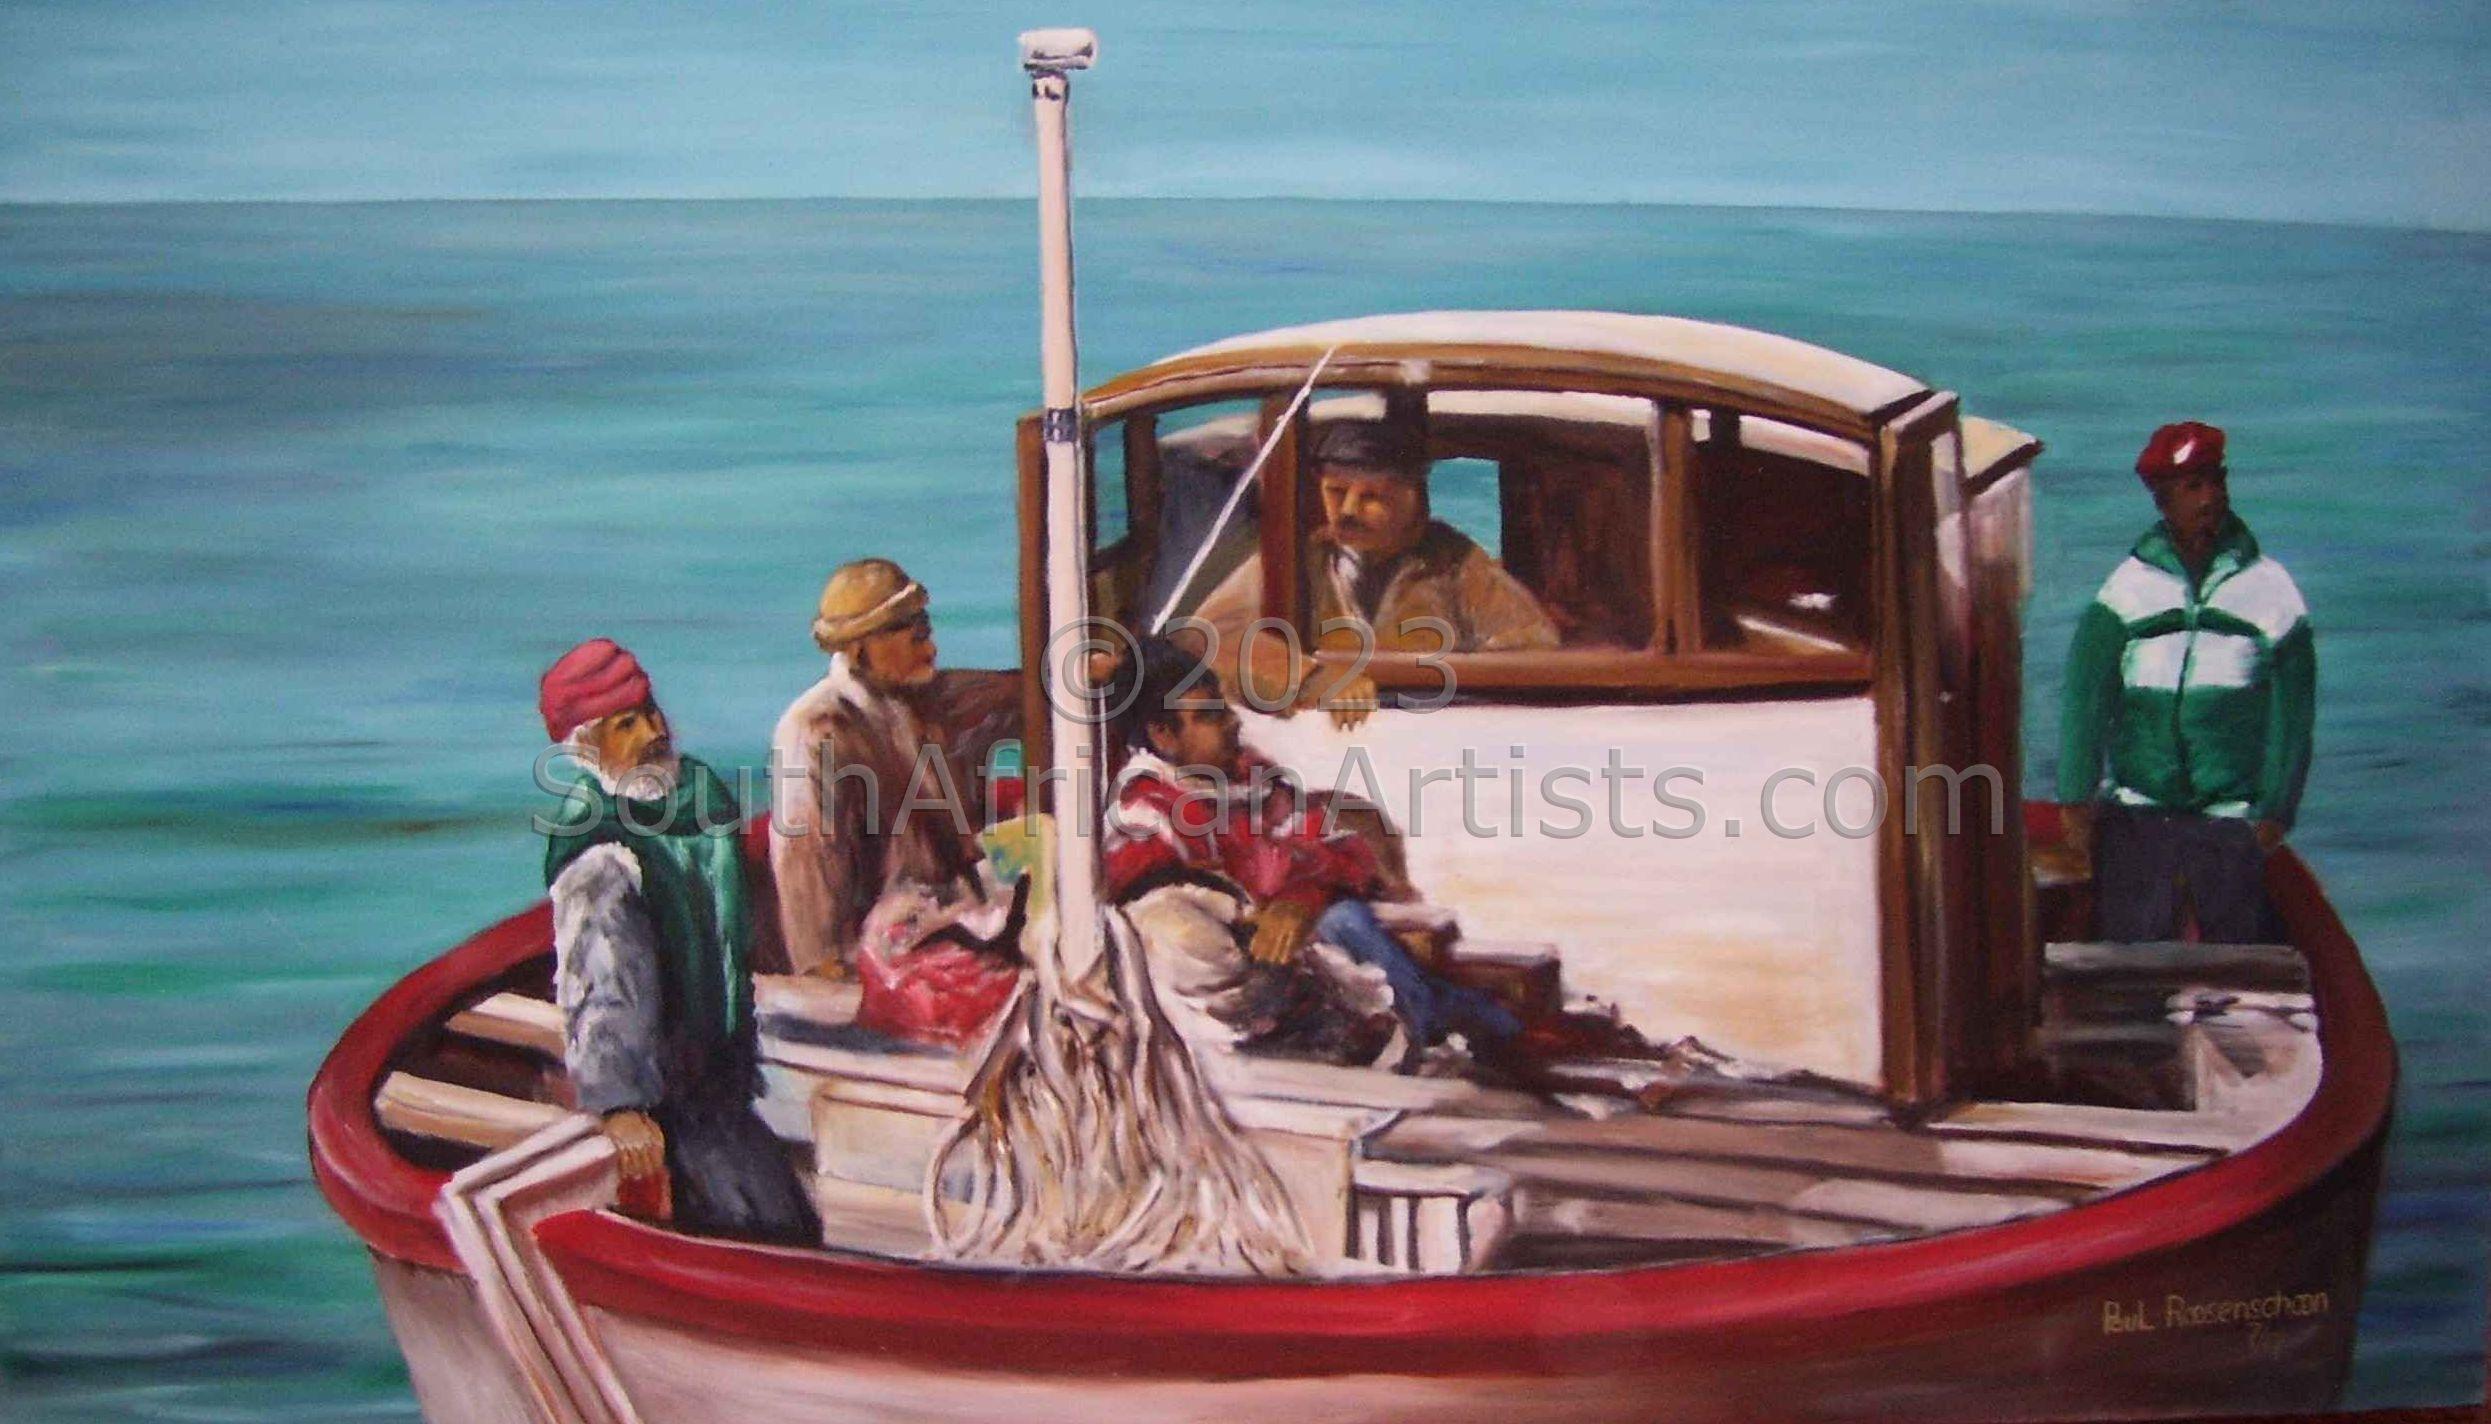 The Fisherman's Boat